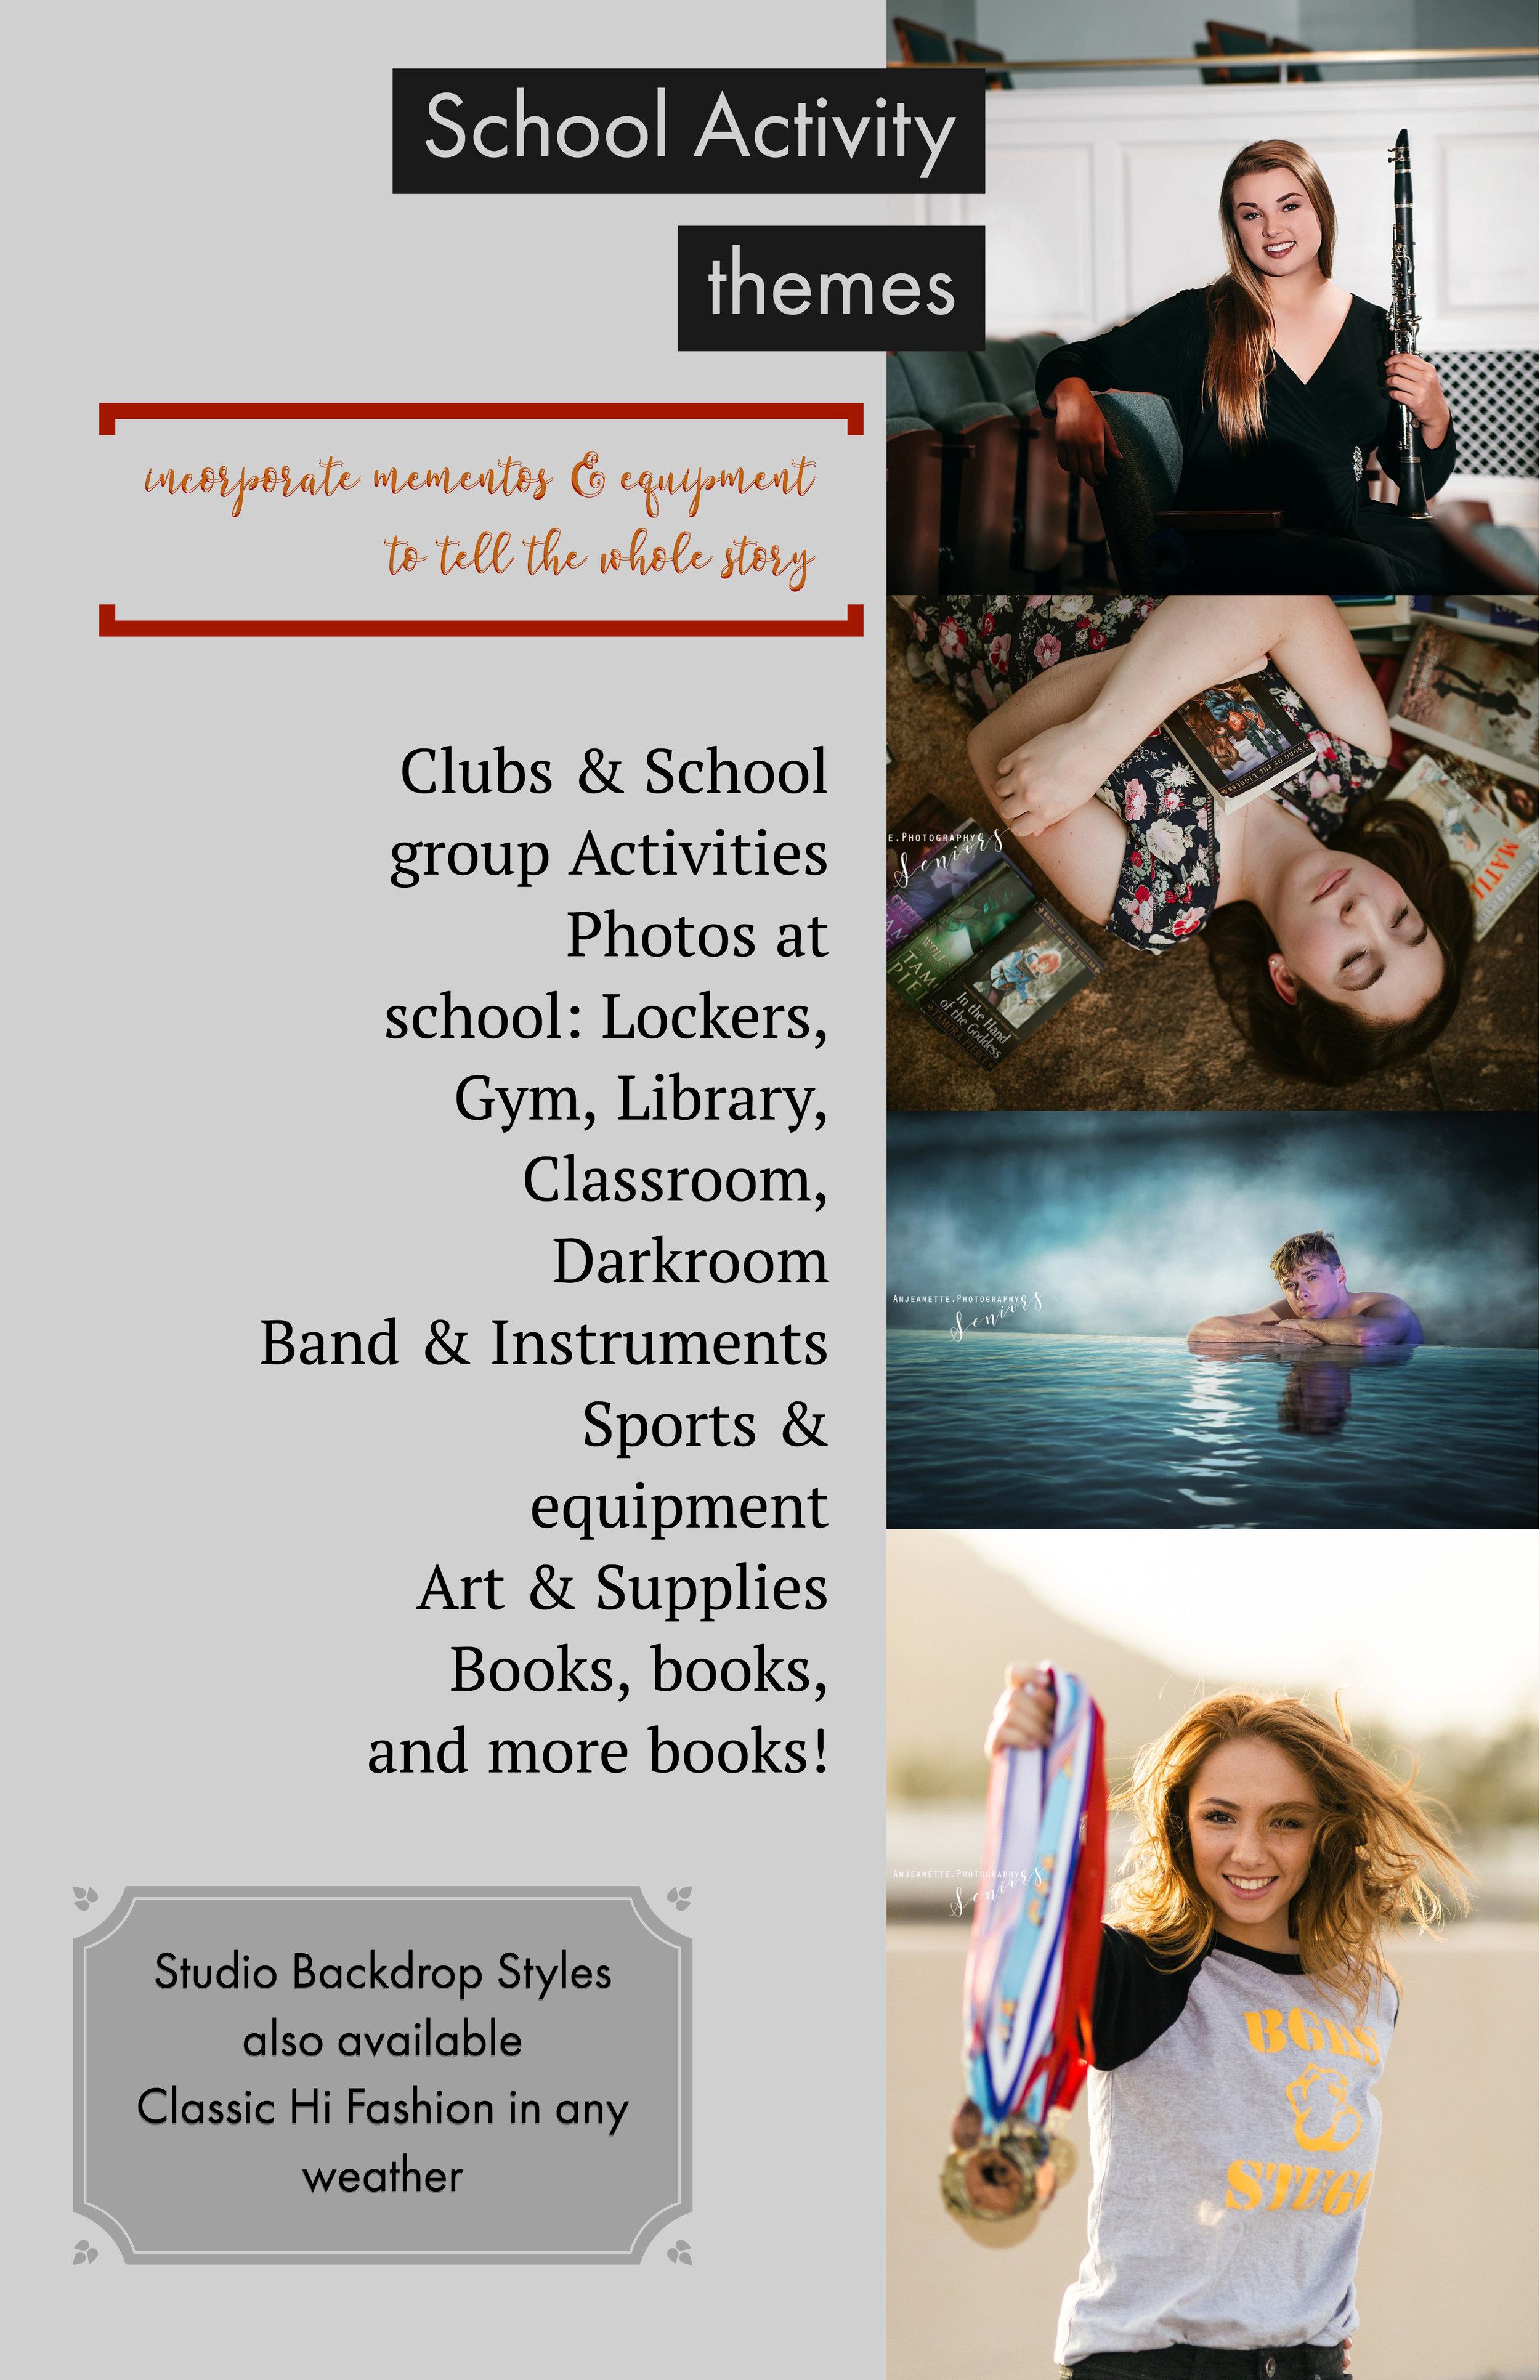 Places to take senior pictures Peoria Az senior grad pictures by Anthem high school portraits, families, & Headshot photographer Anjeanette Photography Phx Arizona